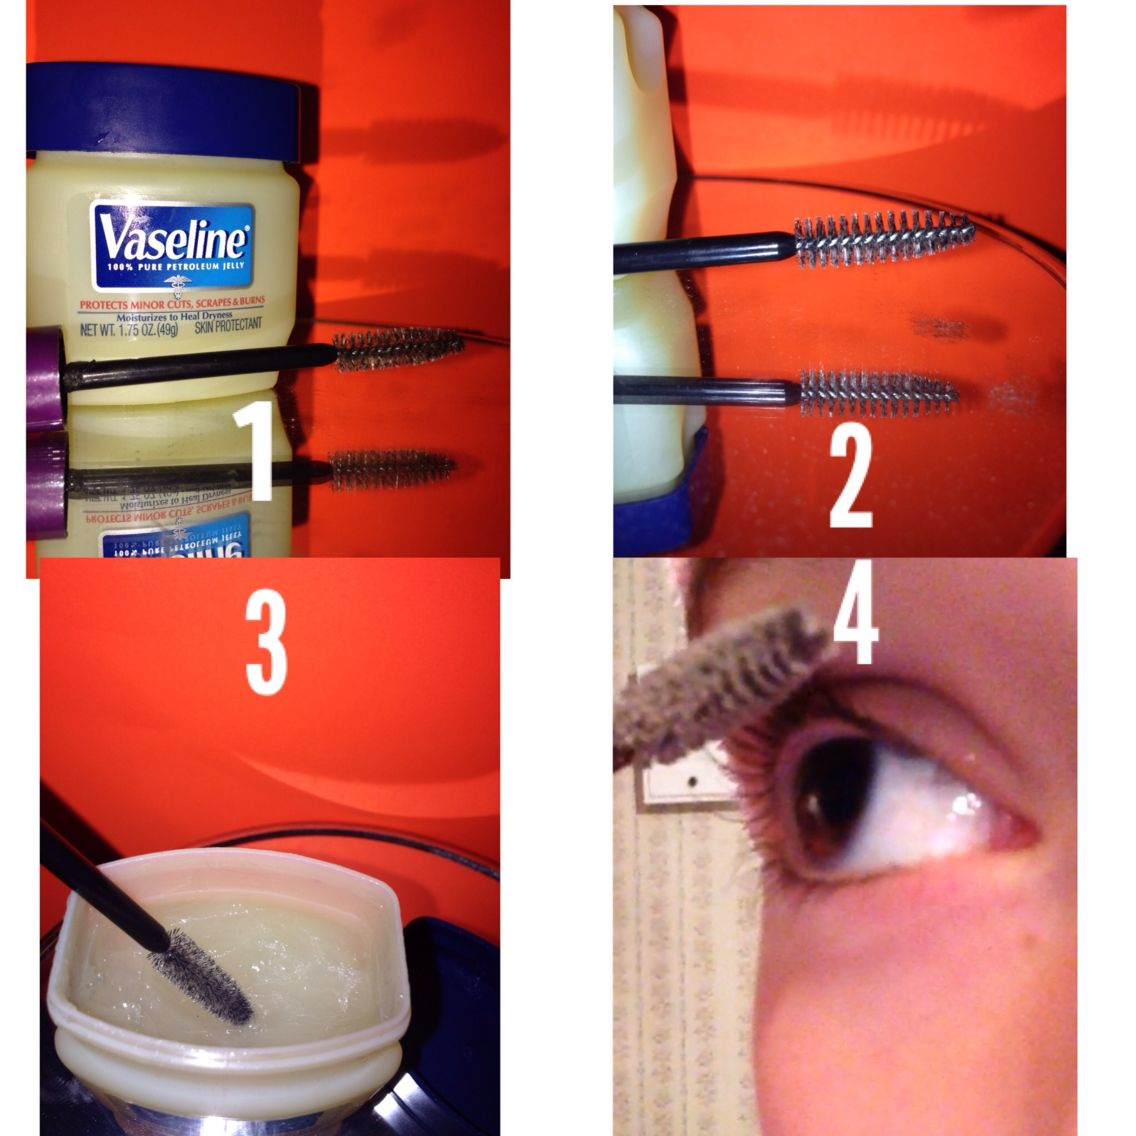 HOW TO GROW BACK YOUR EYELASHES!! 1: get Vaseline/petroleum jelly ...